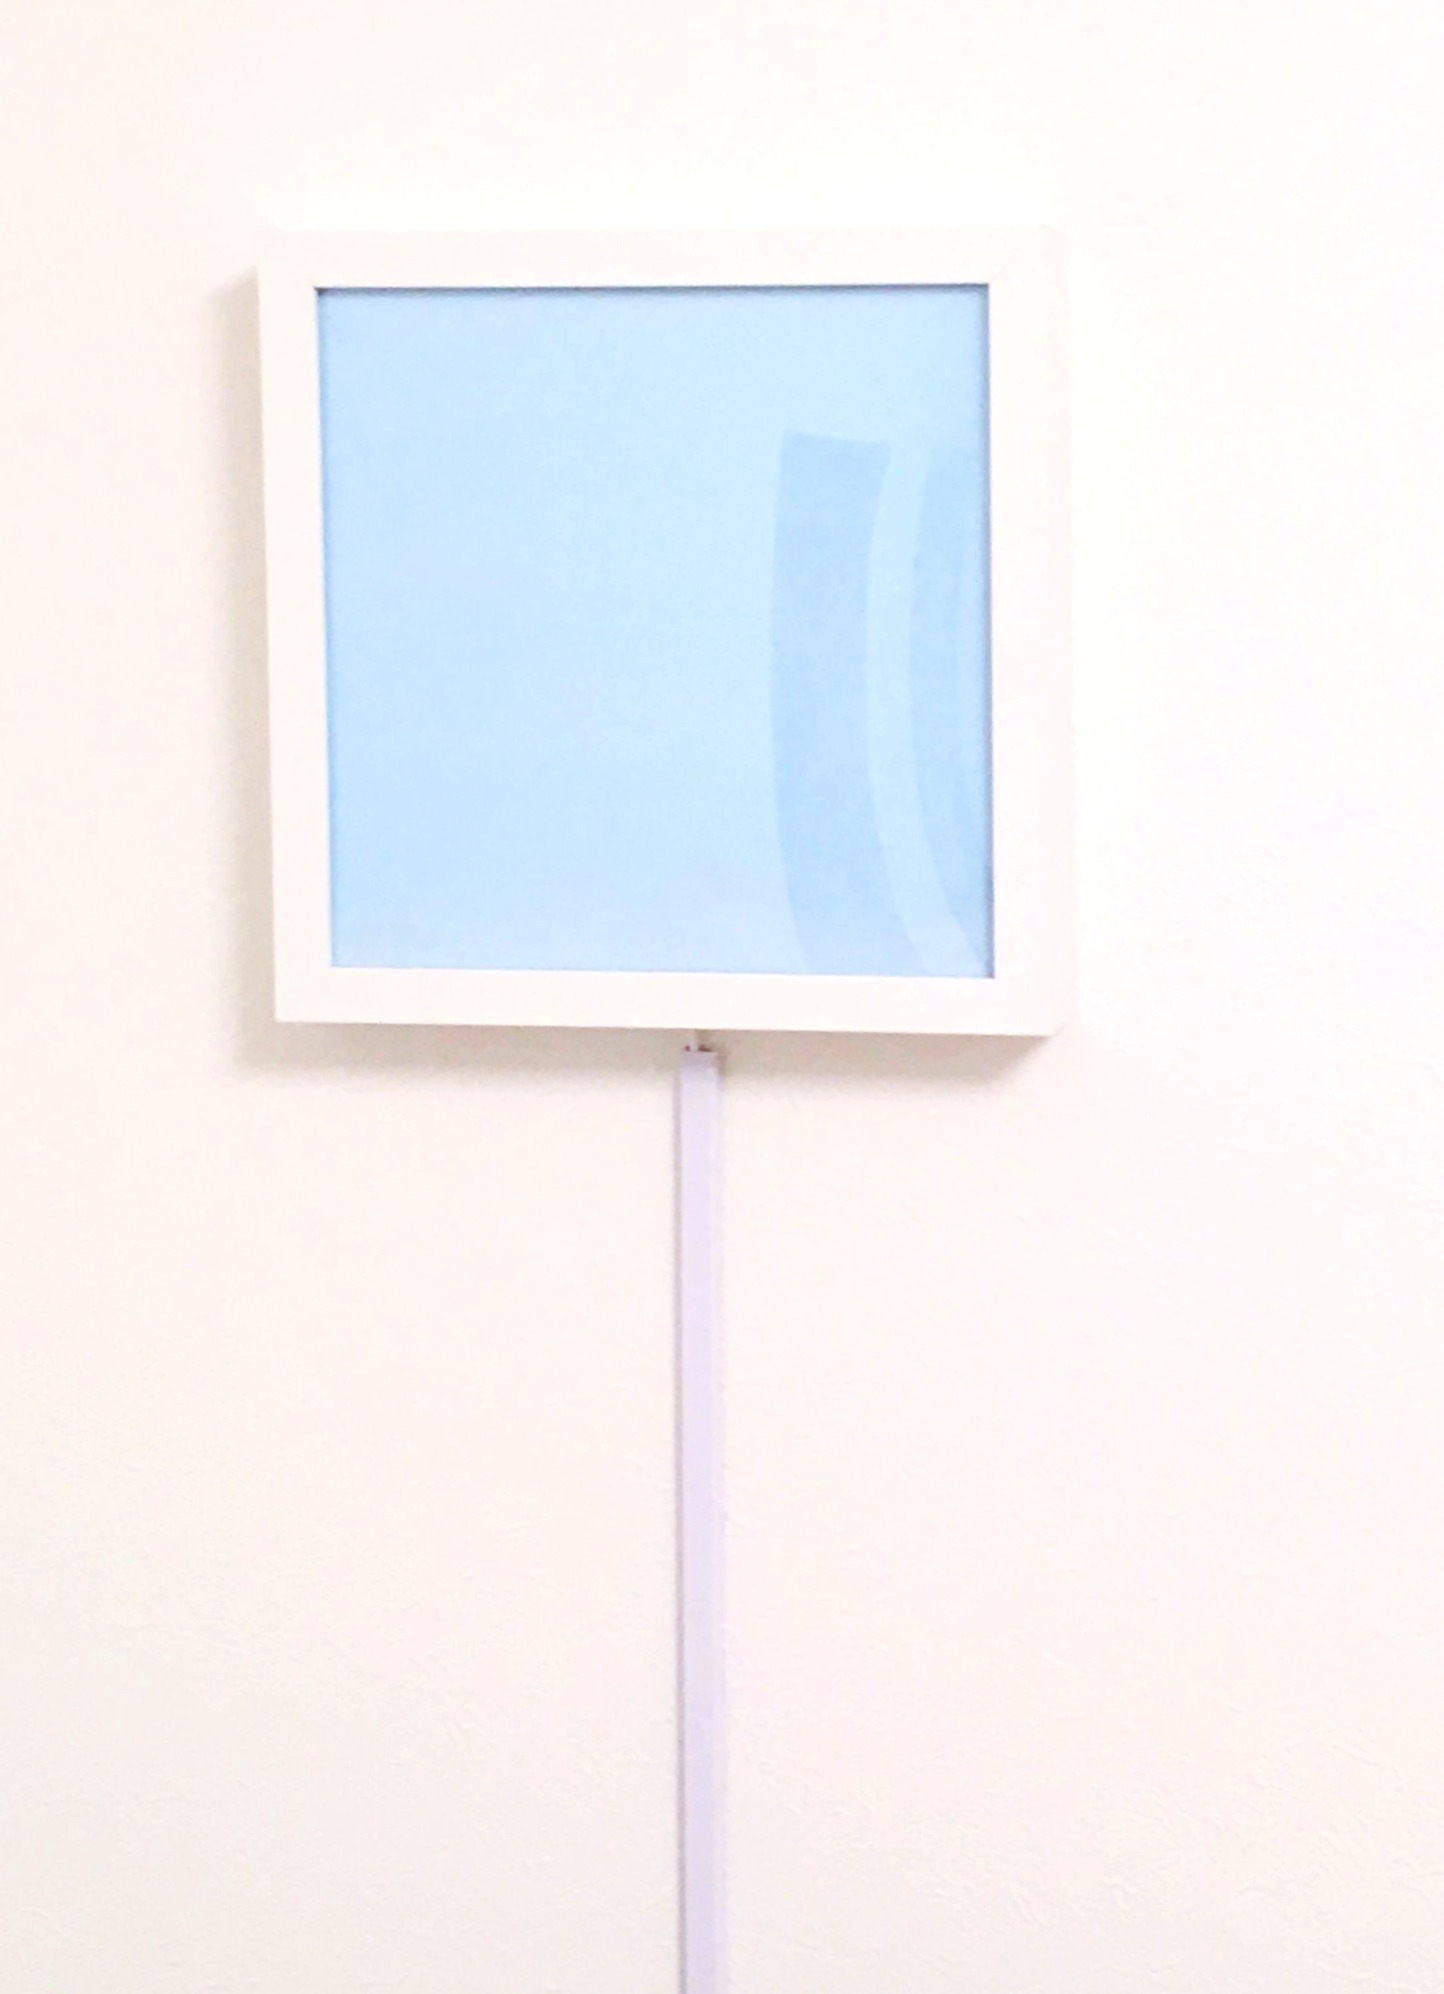 B.壁に直接固定する例